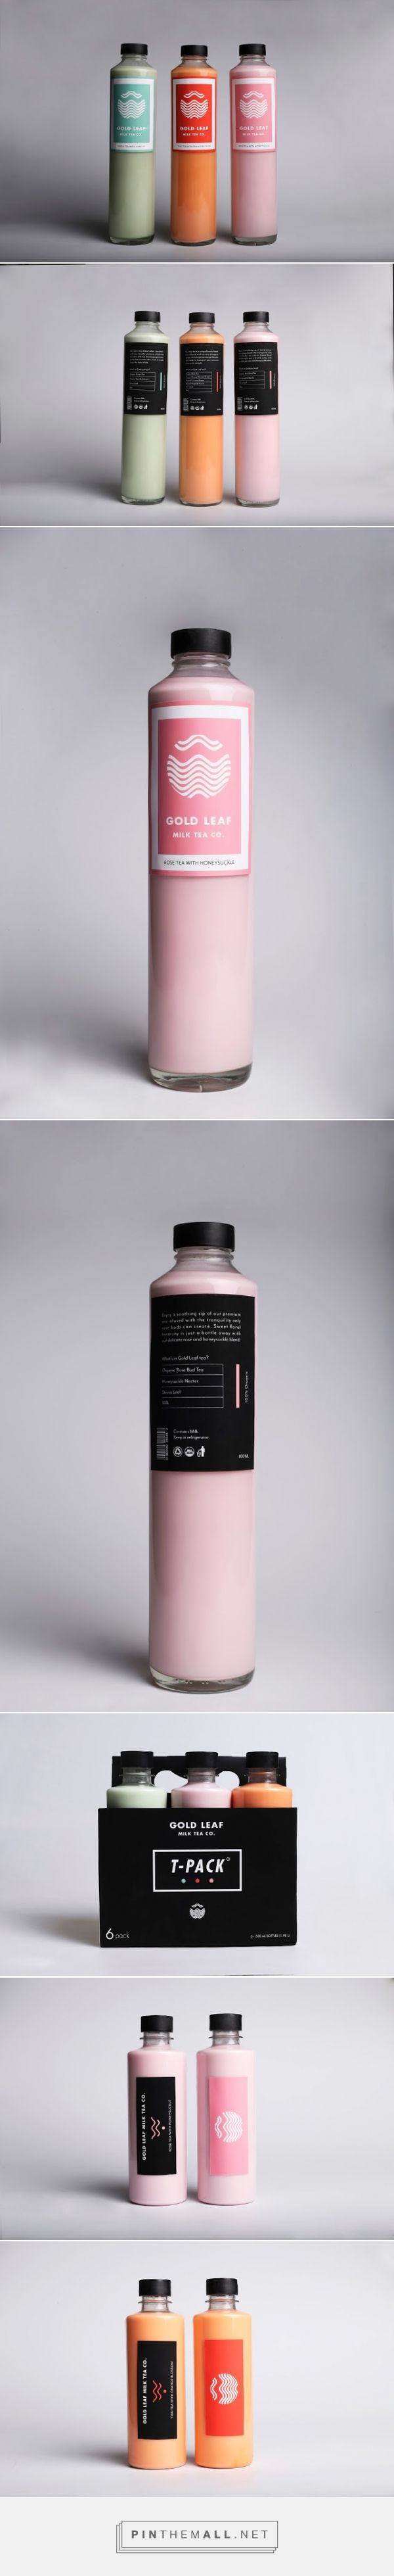 GoldLeaf Milk Tea Co. (Student Project) by Adam Heisig